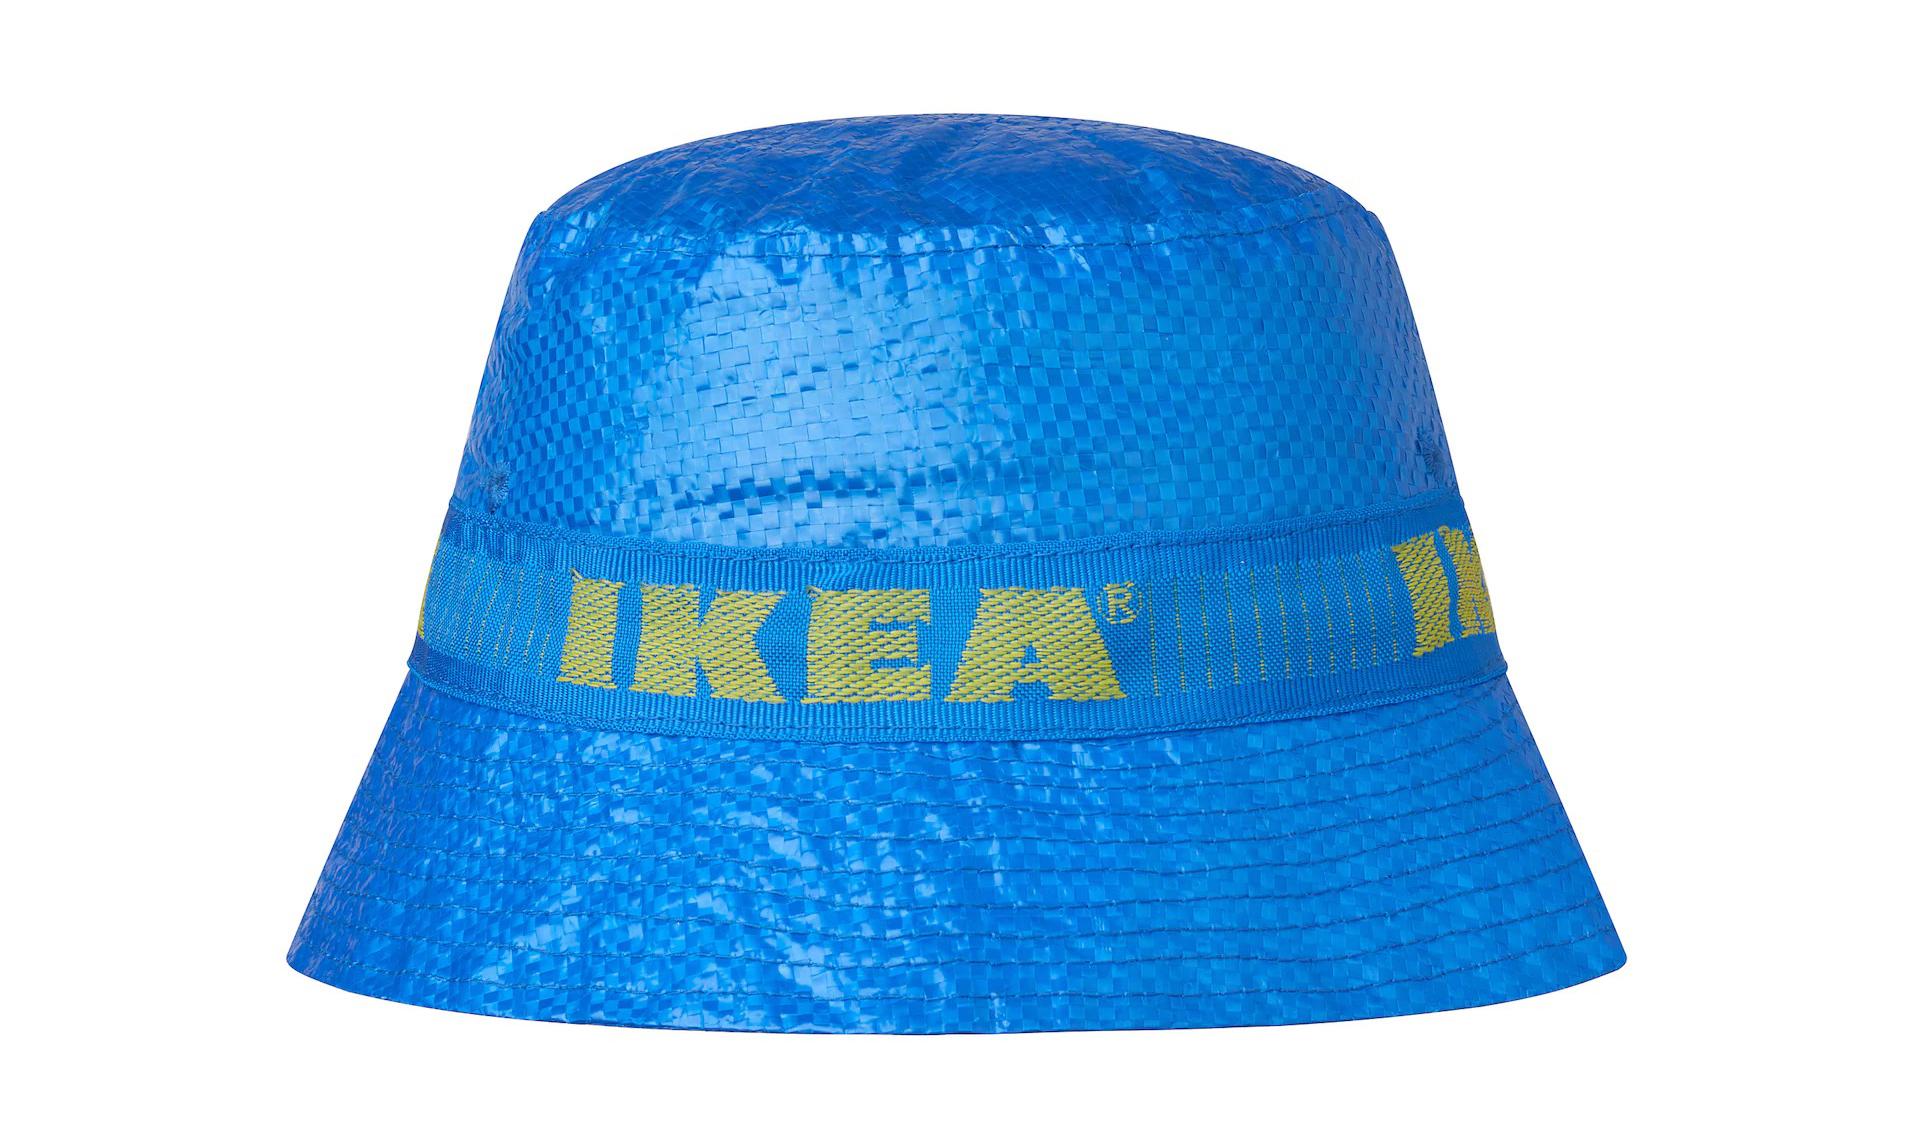 IKEA KNORVA 渔夫帽再度补货发售